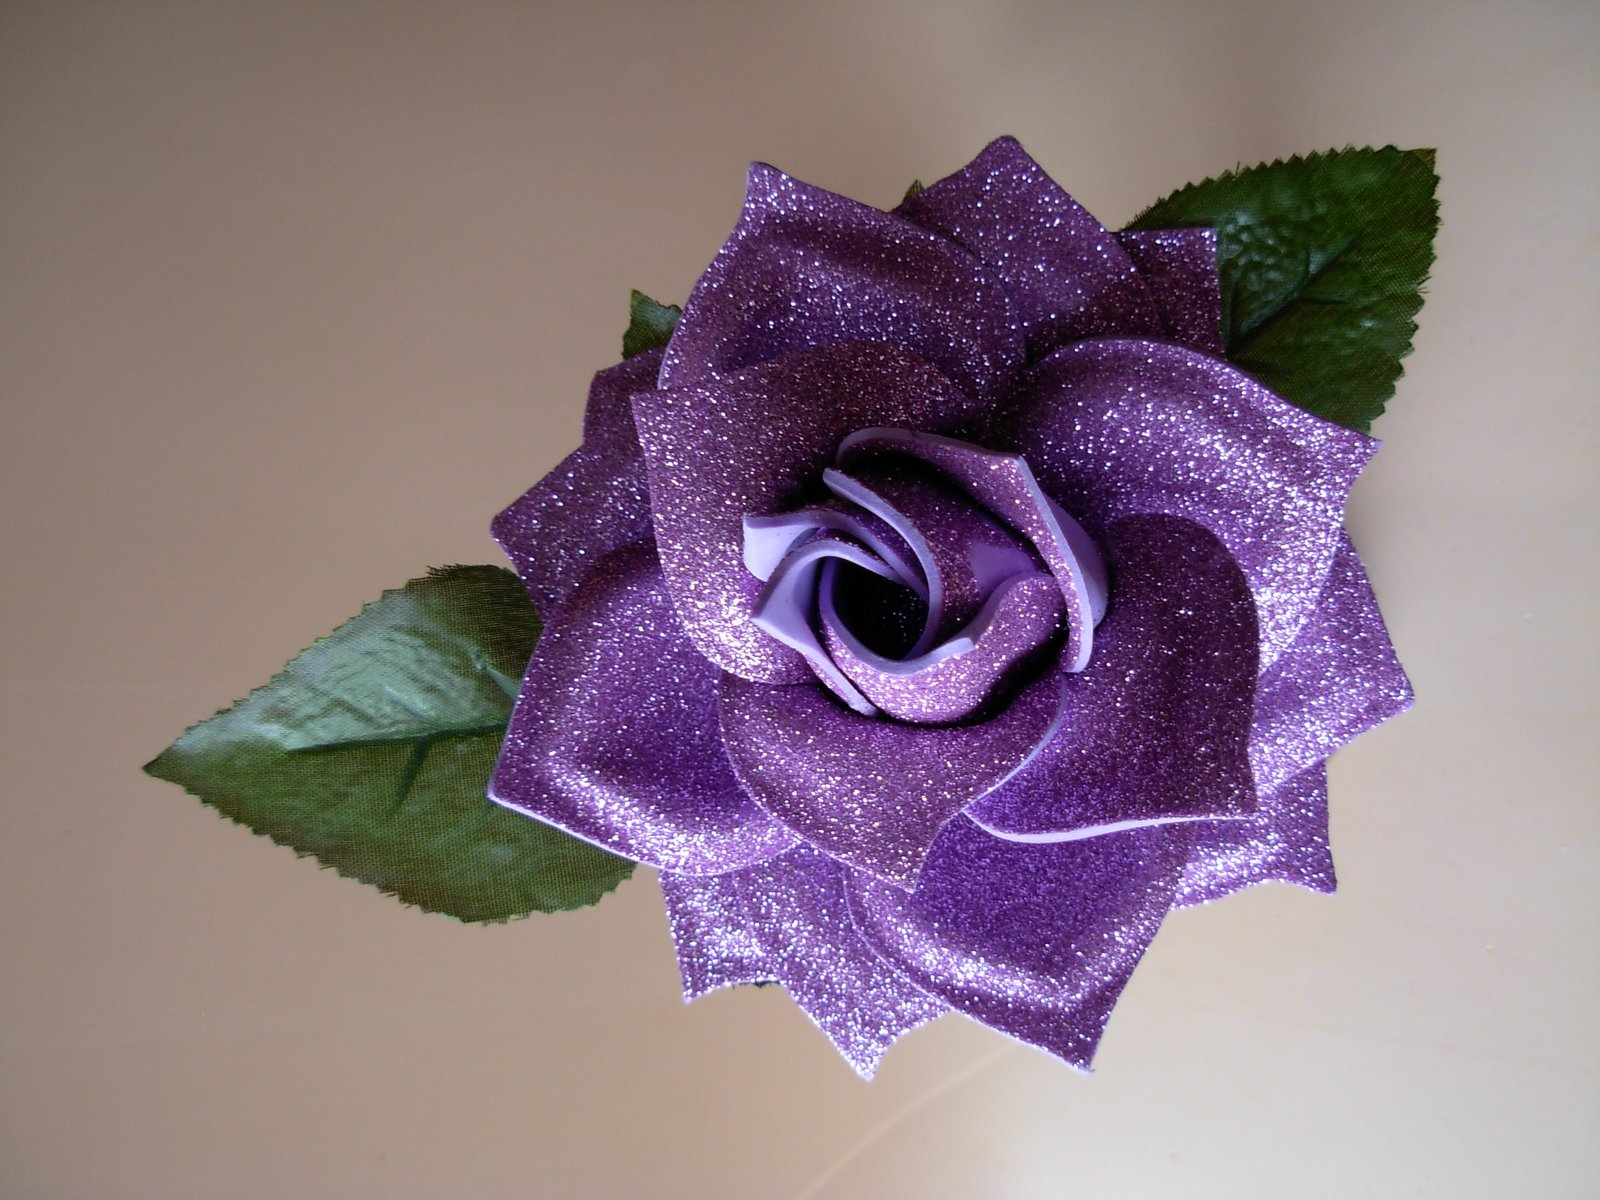 Confeccion de flores con goma eva imagui - Flores con goma eva ...